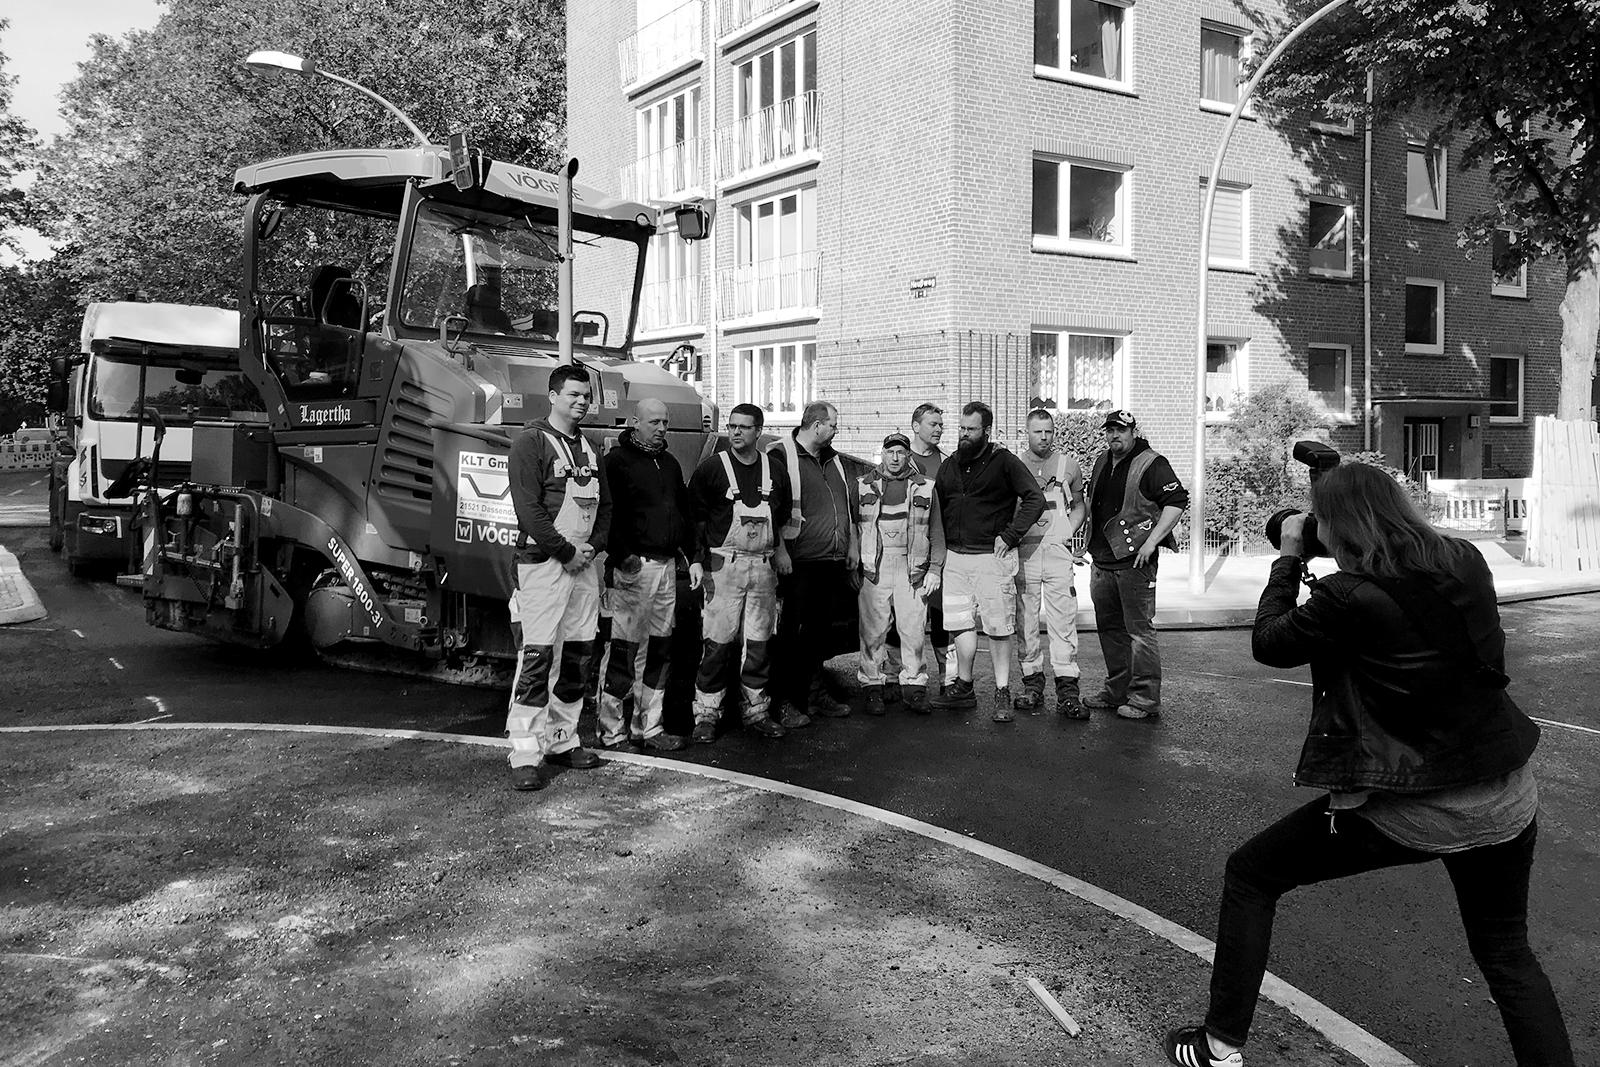 KLT Verkehrswegebau GmbH, Straßenbau, bts, Making Of, baustelle Heußweg